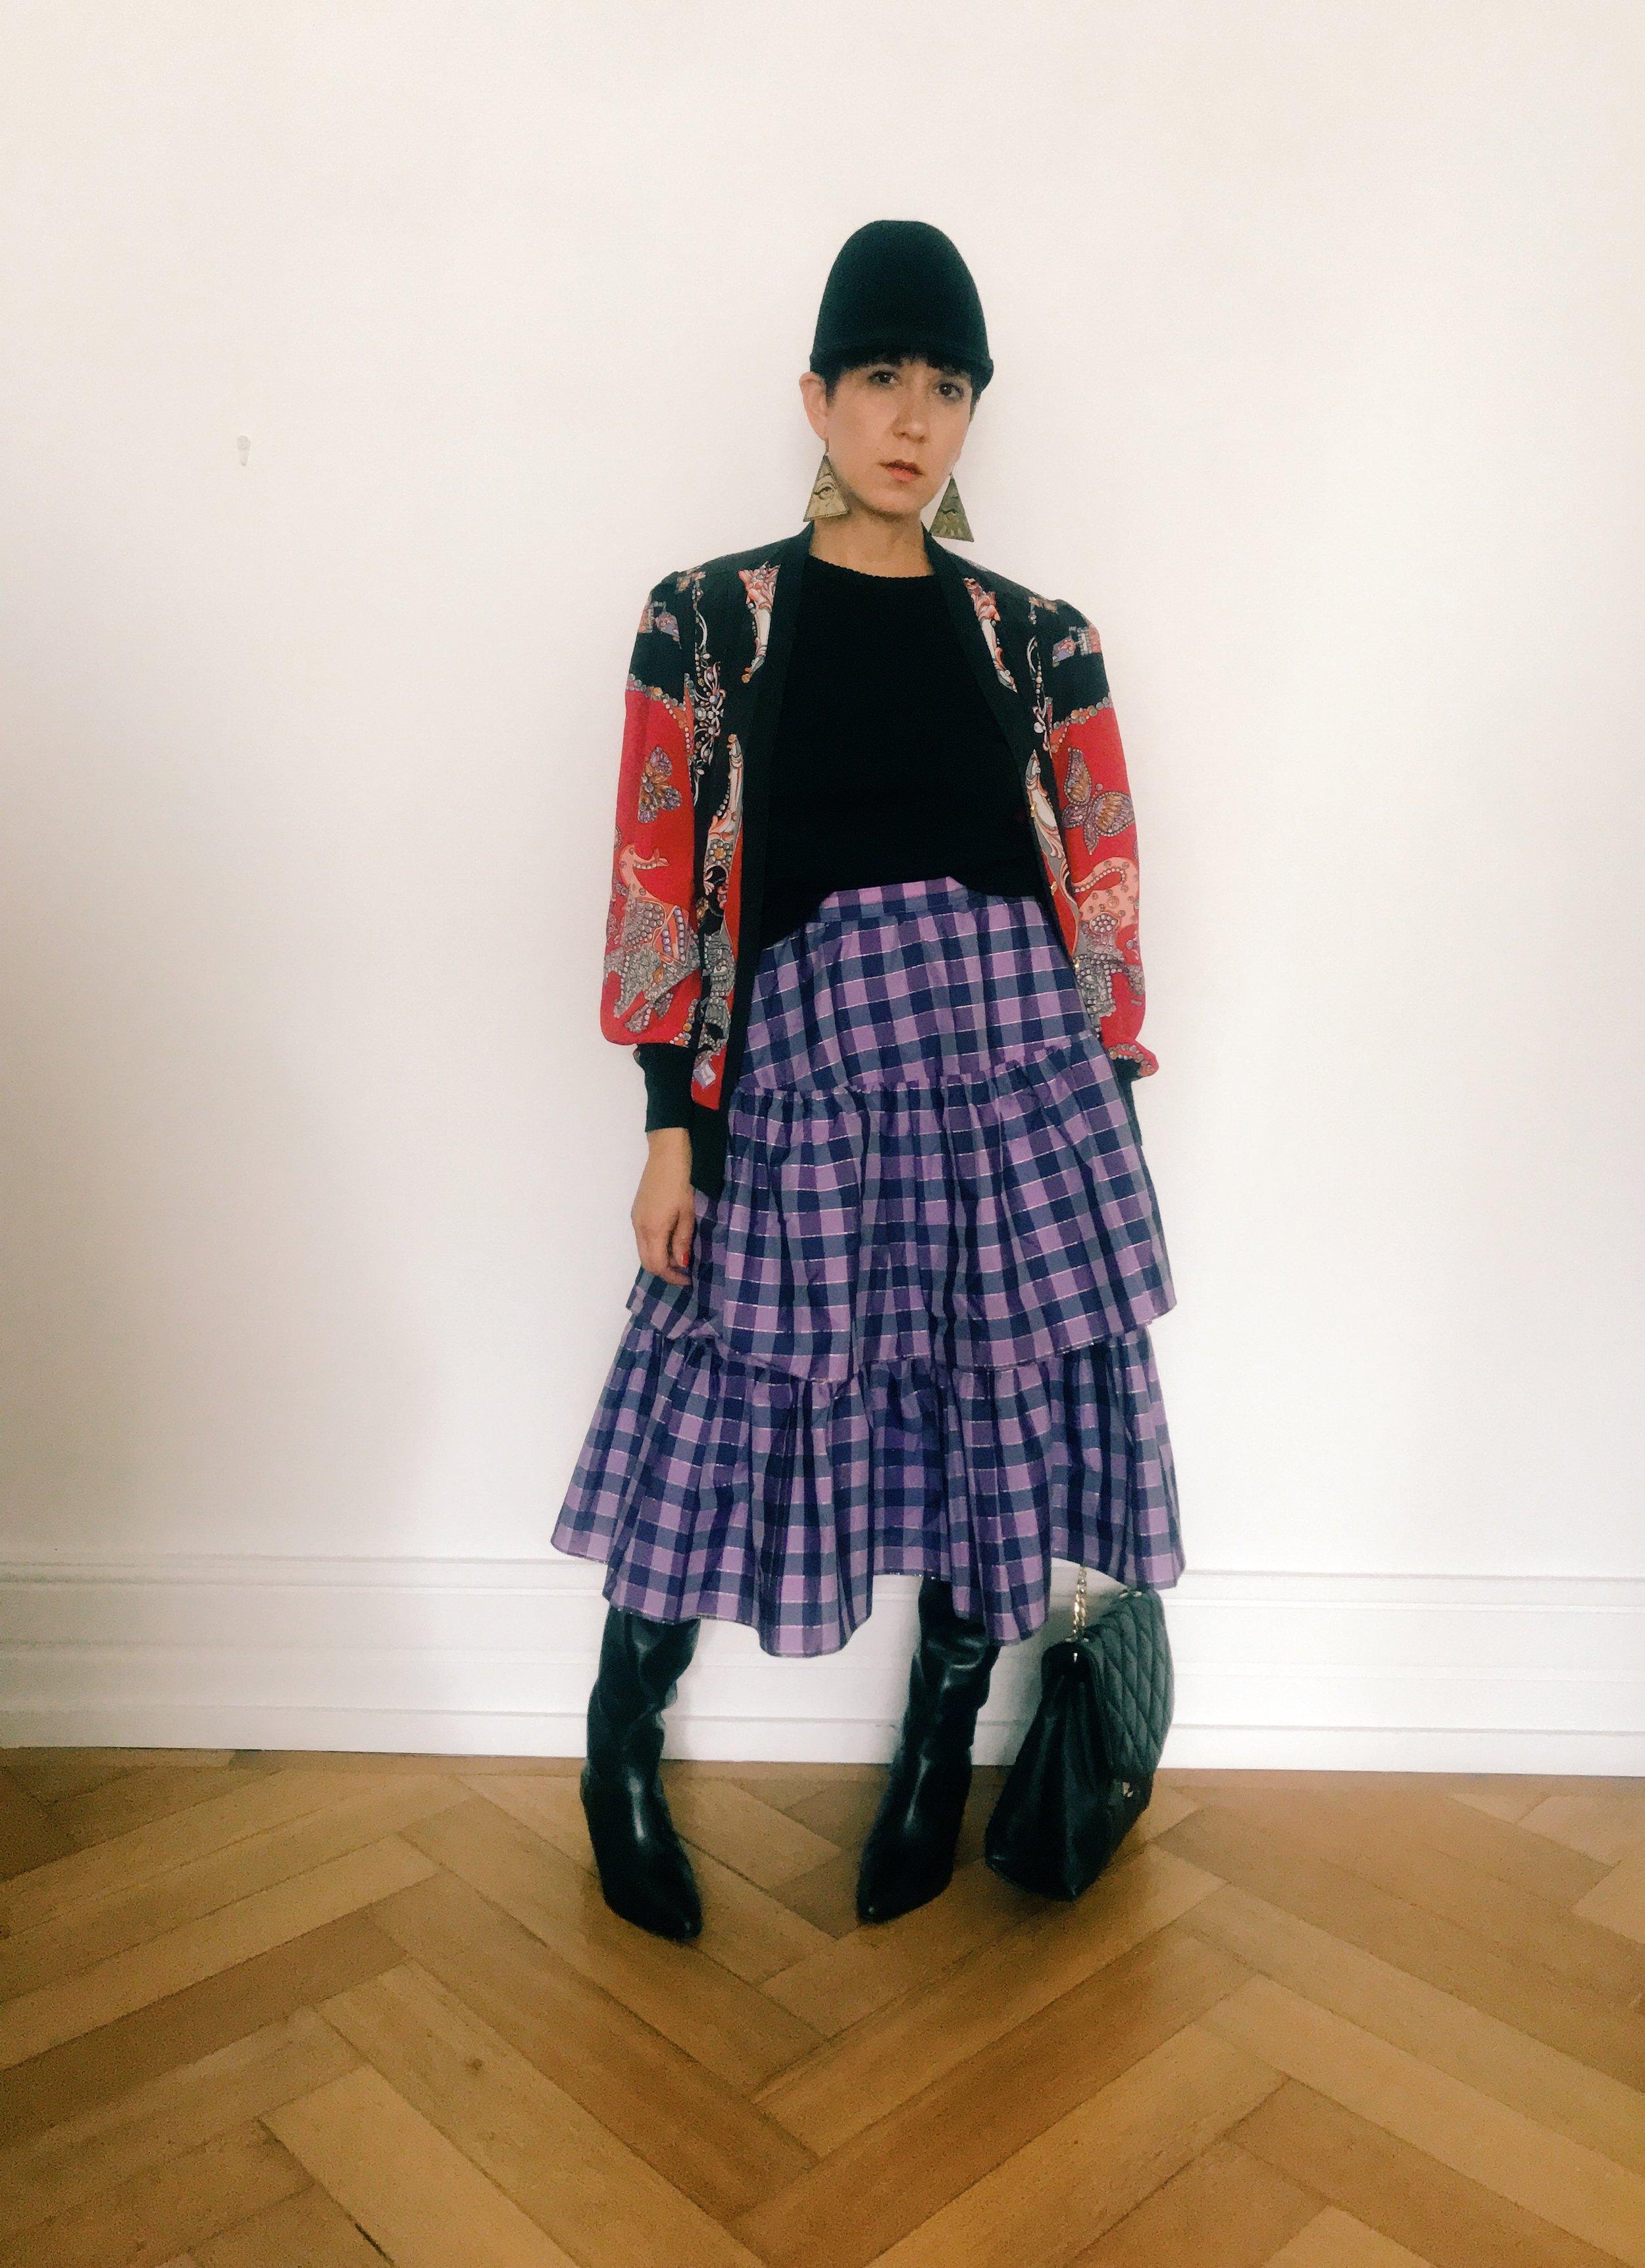 evening - skirt worn with felt hat, Rosita Bonita earrings, vintage coat from Vintage Revivals, black shirt from Zara, boots from & Other Stories, secondhand handbag